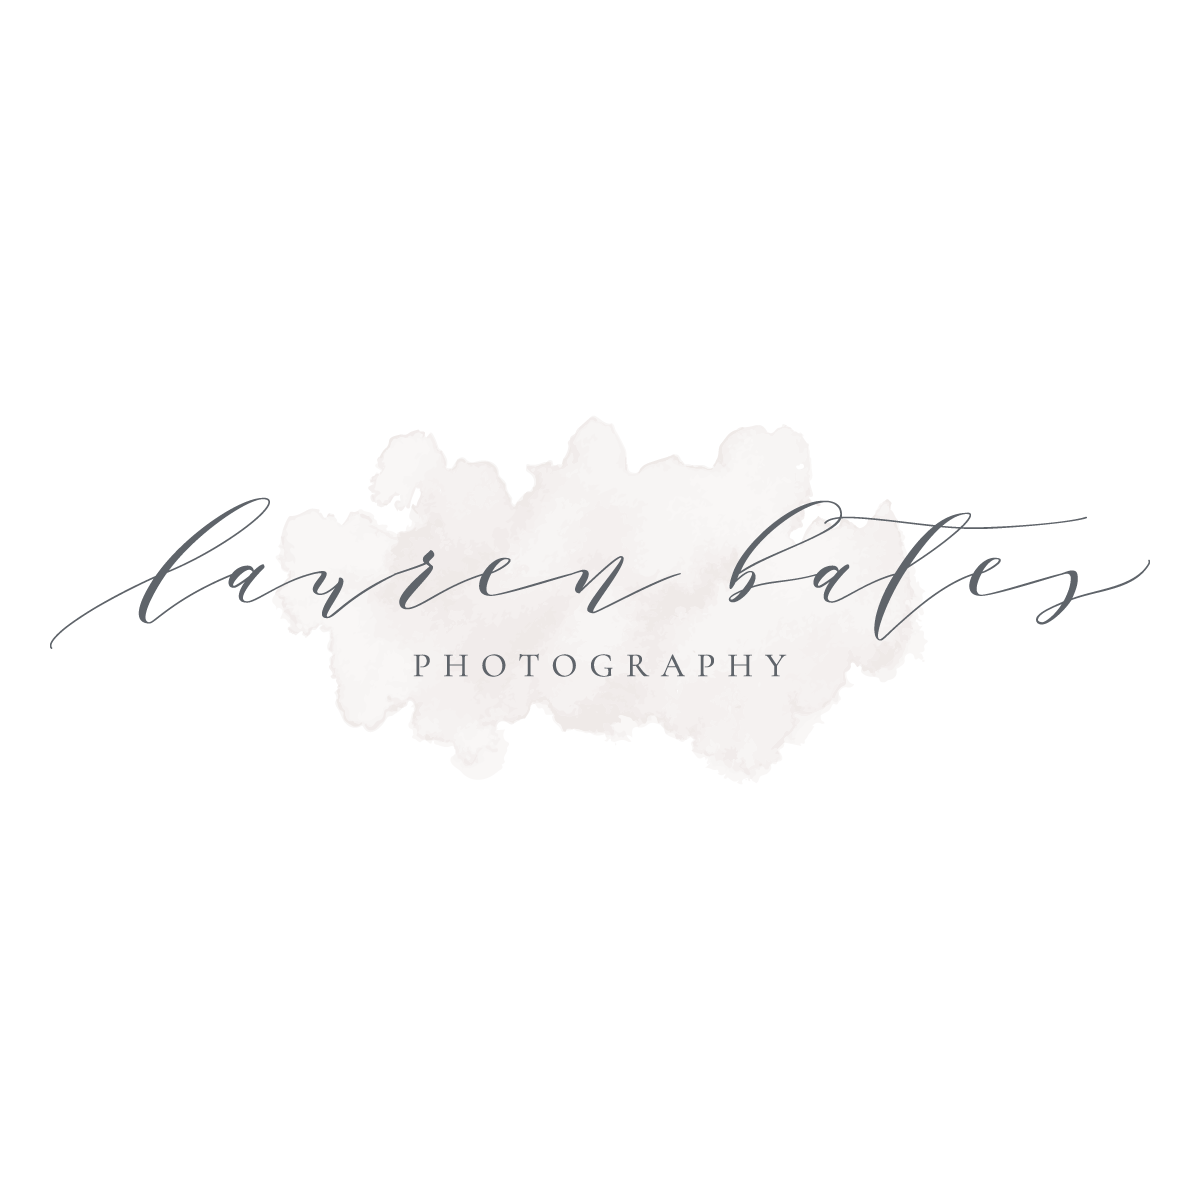 Lauren Bates Photography Destination Wedding Photographer based in Central Florida